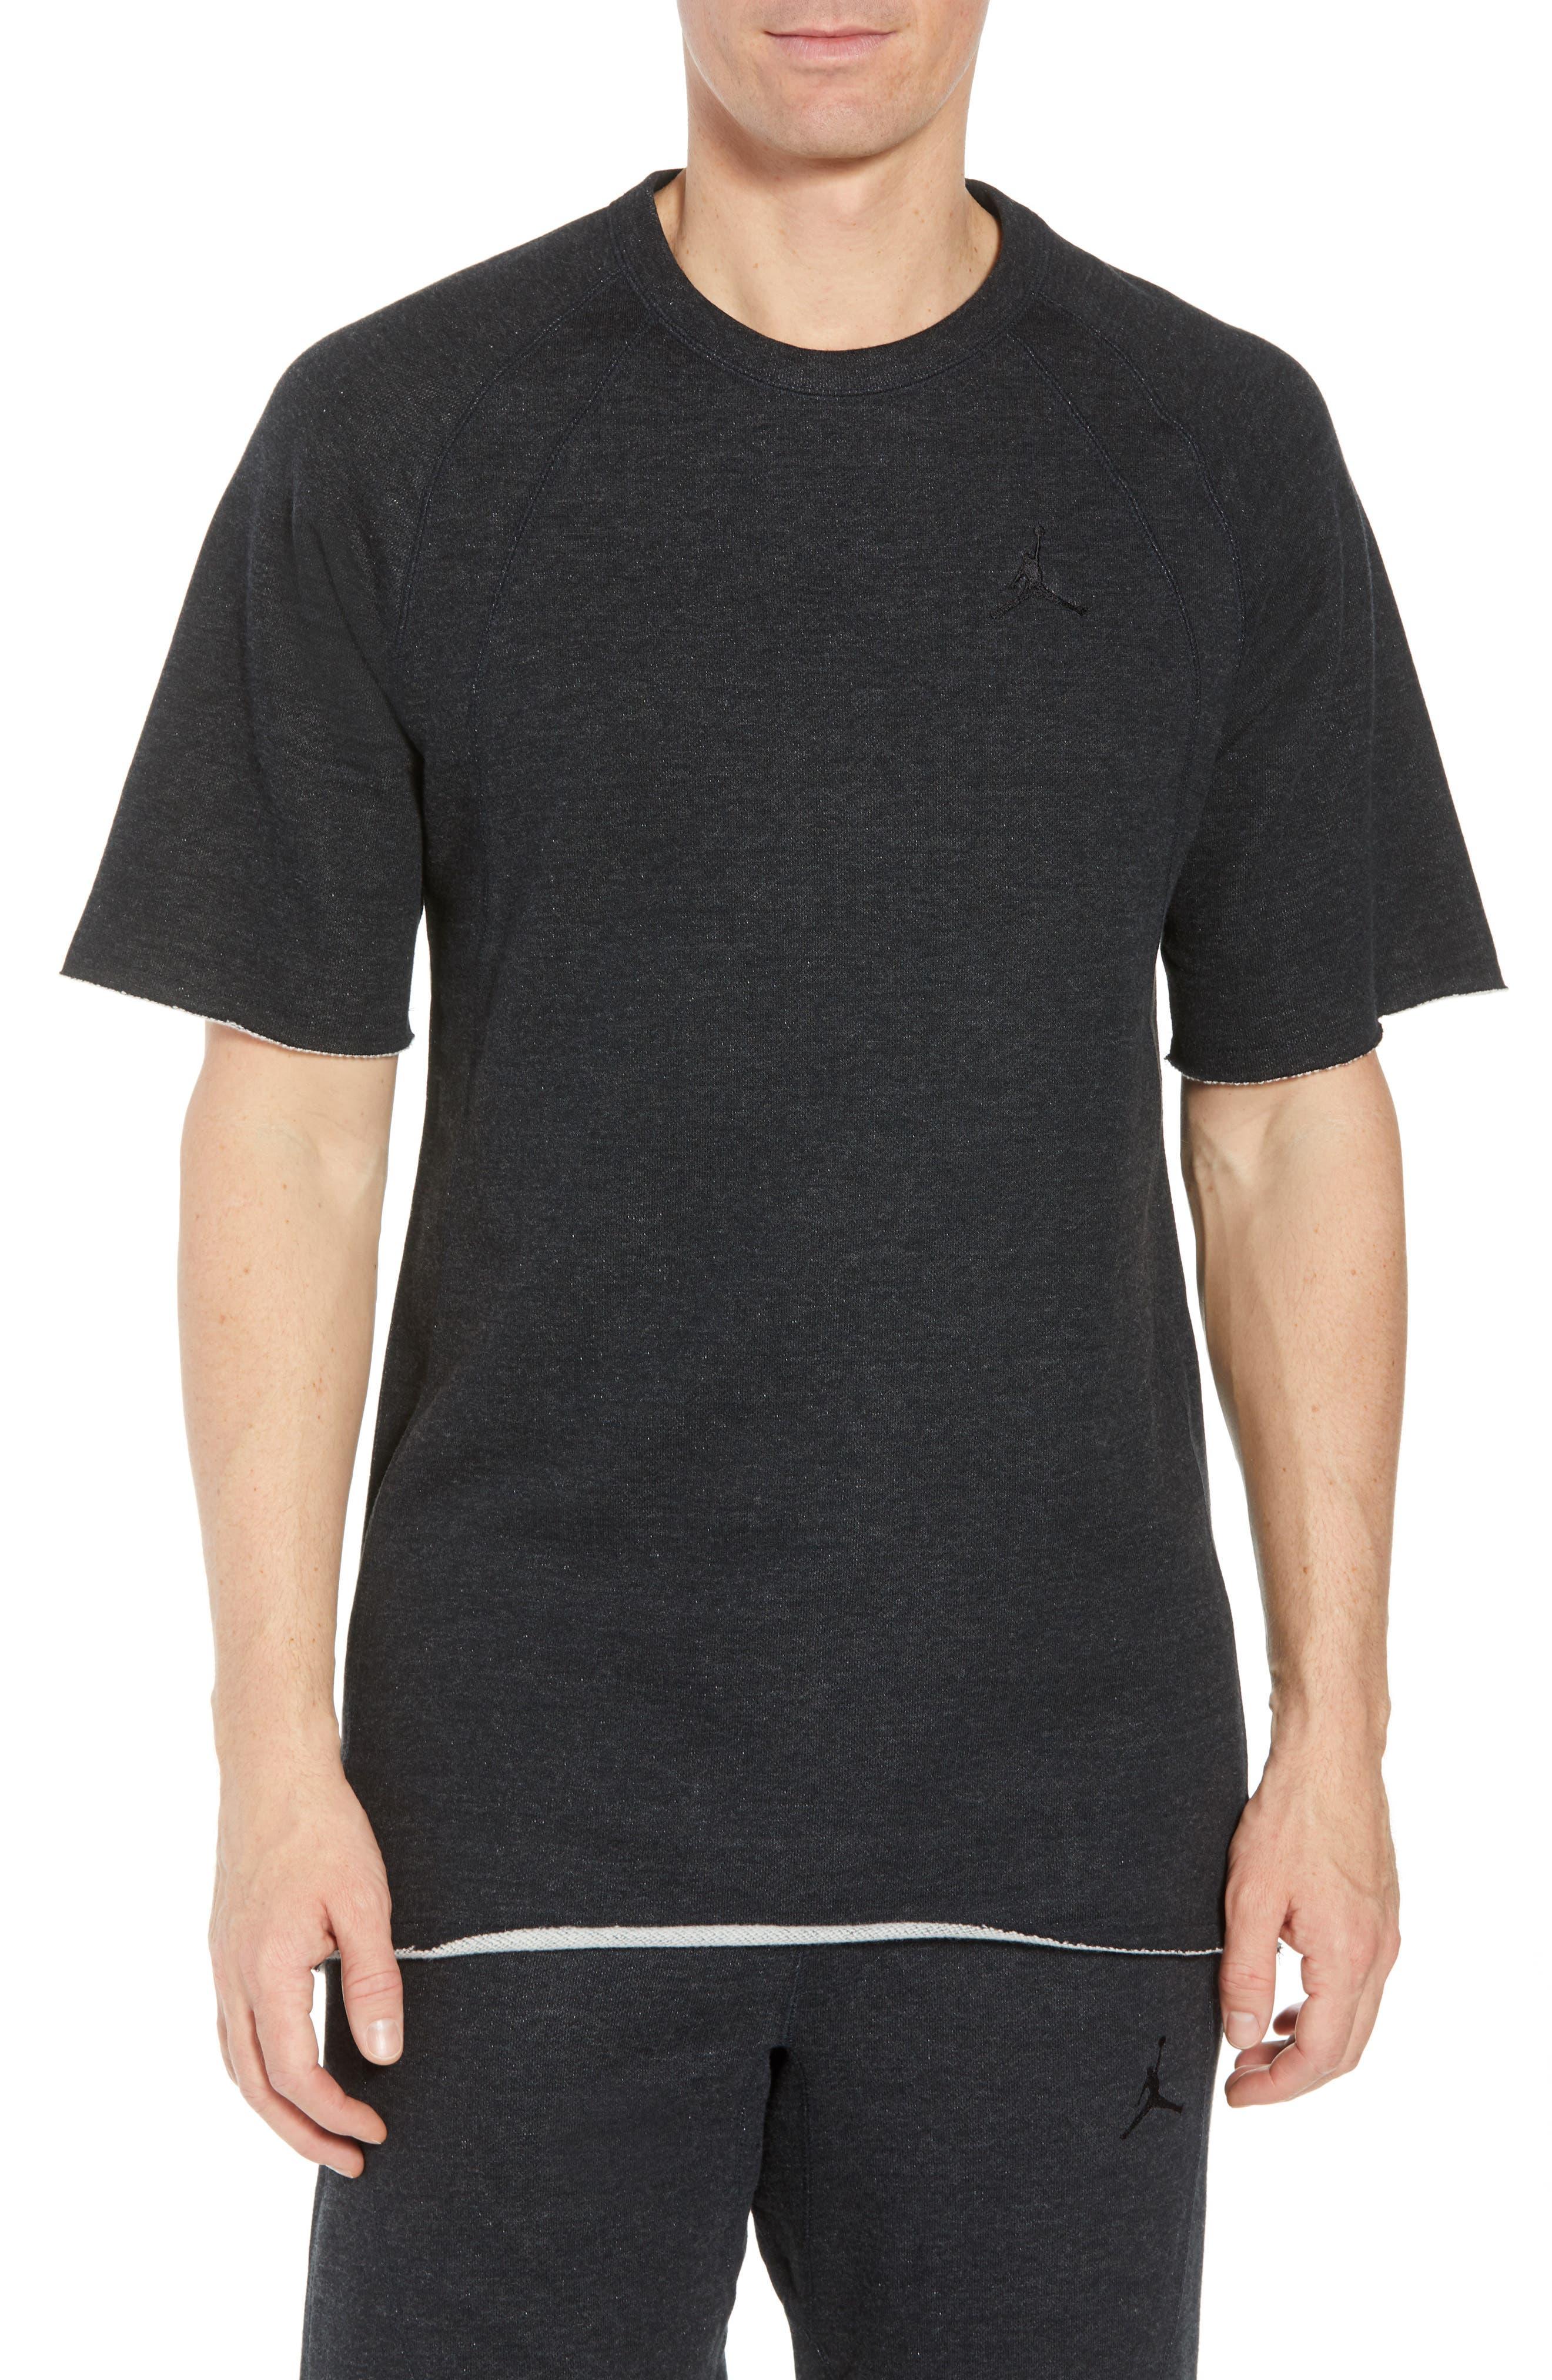 Wings Light Short Sleeve Sweatshirt,                         Main,                         color, BLACK HEATHER/ BLACK